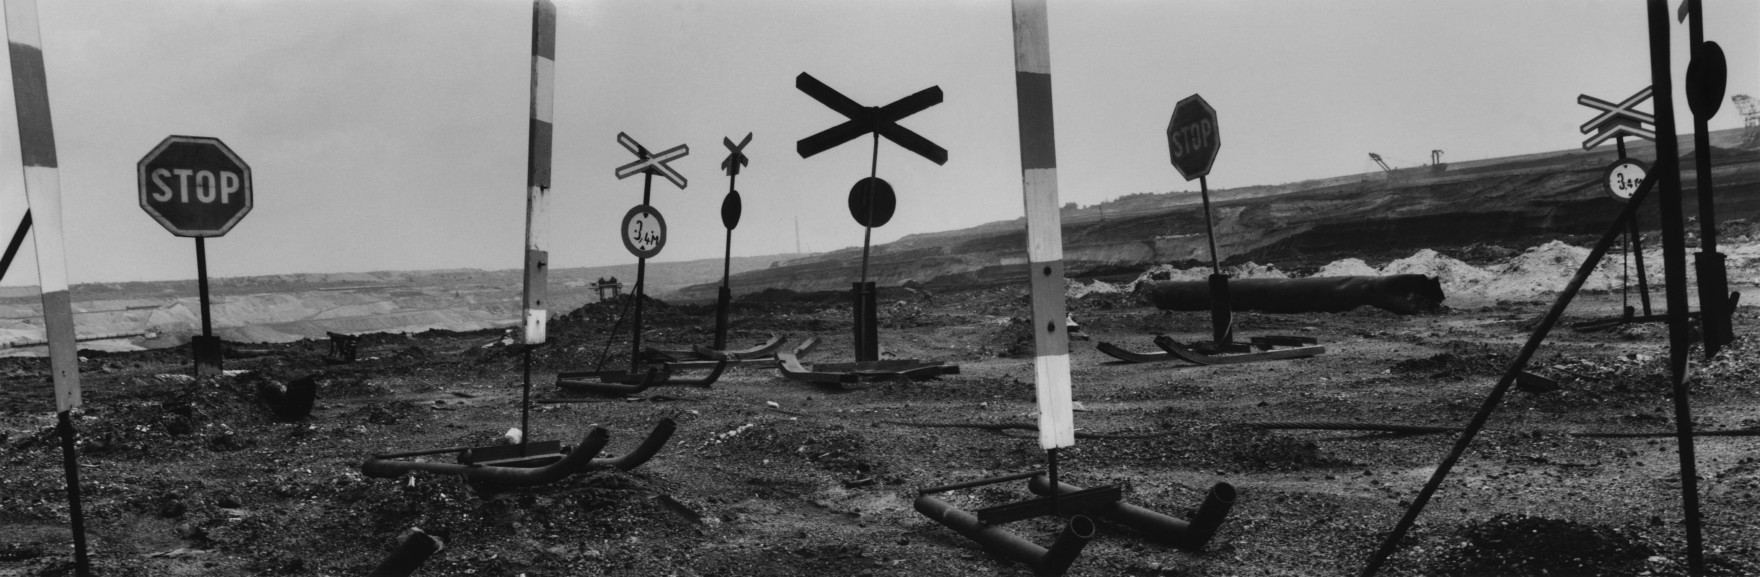 Josef koudelka the black triangle • magnum photos